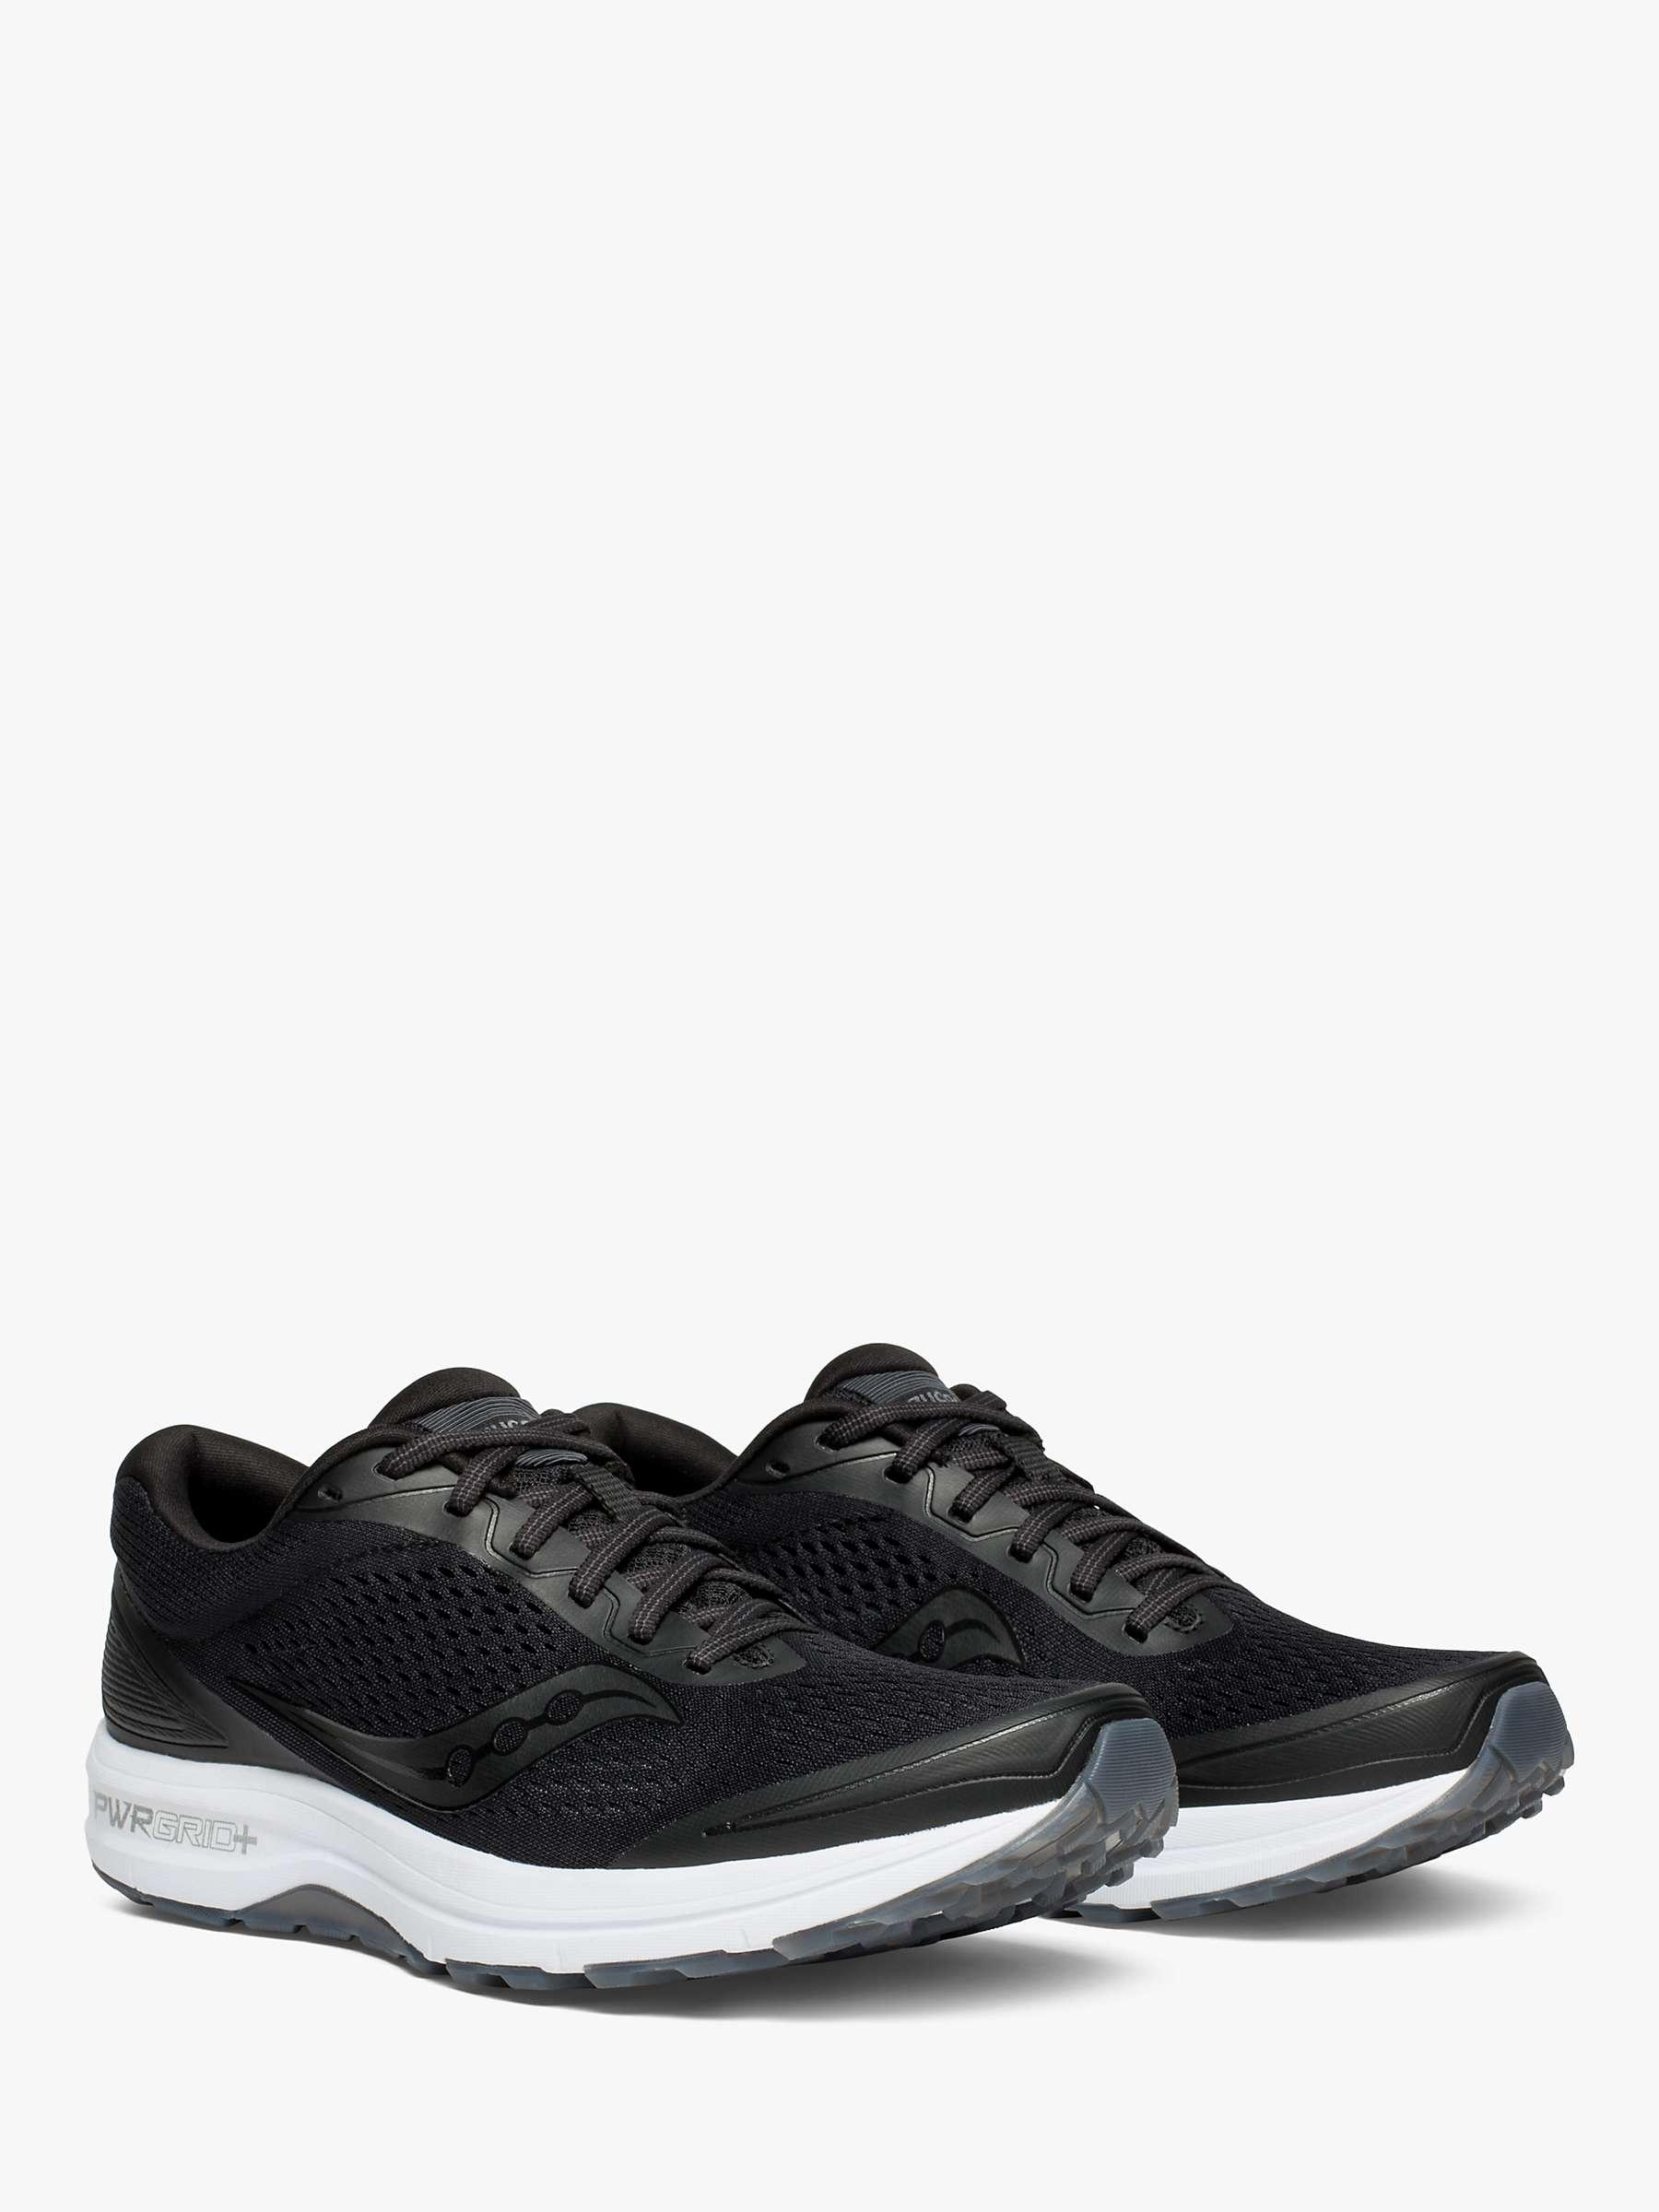 za kilka dni kod promocyjny buty temperamentu Saucony Clarion Men's Running Shoes, Black at John Lewis ...